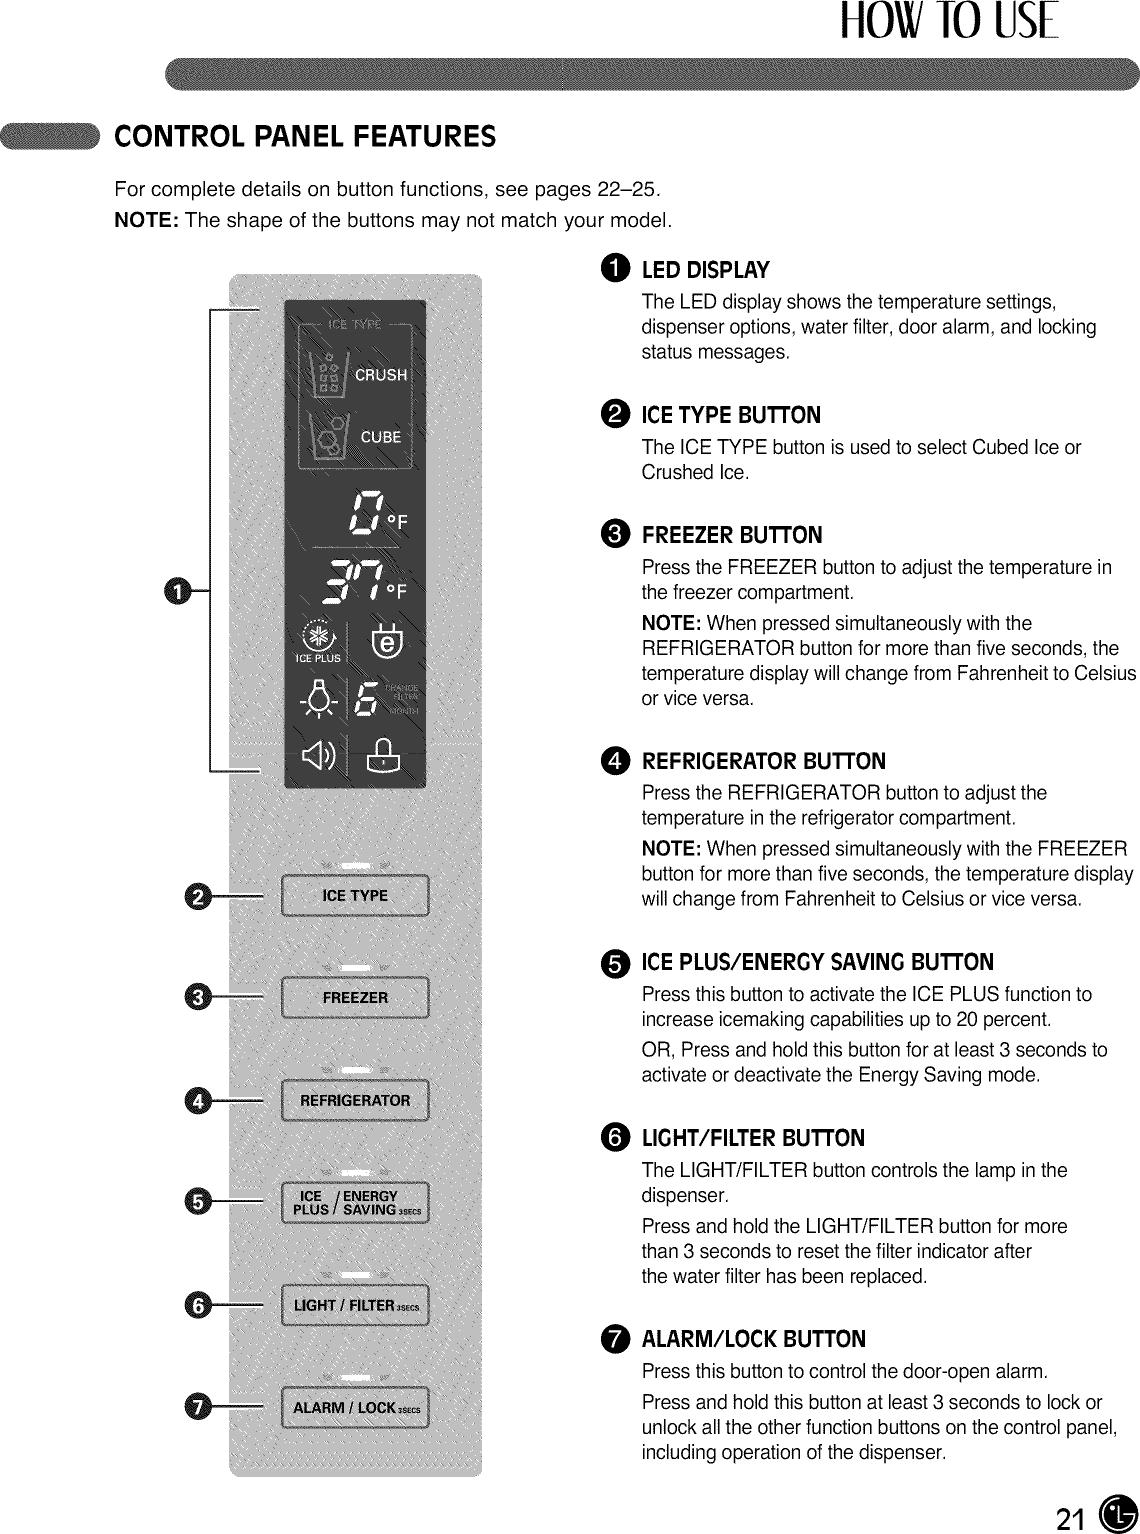 LG LFX28978SB/01 User Manual REFRIGERATOR Manuals And Guides